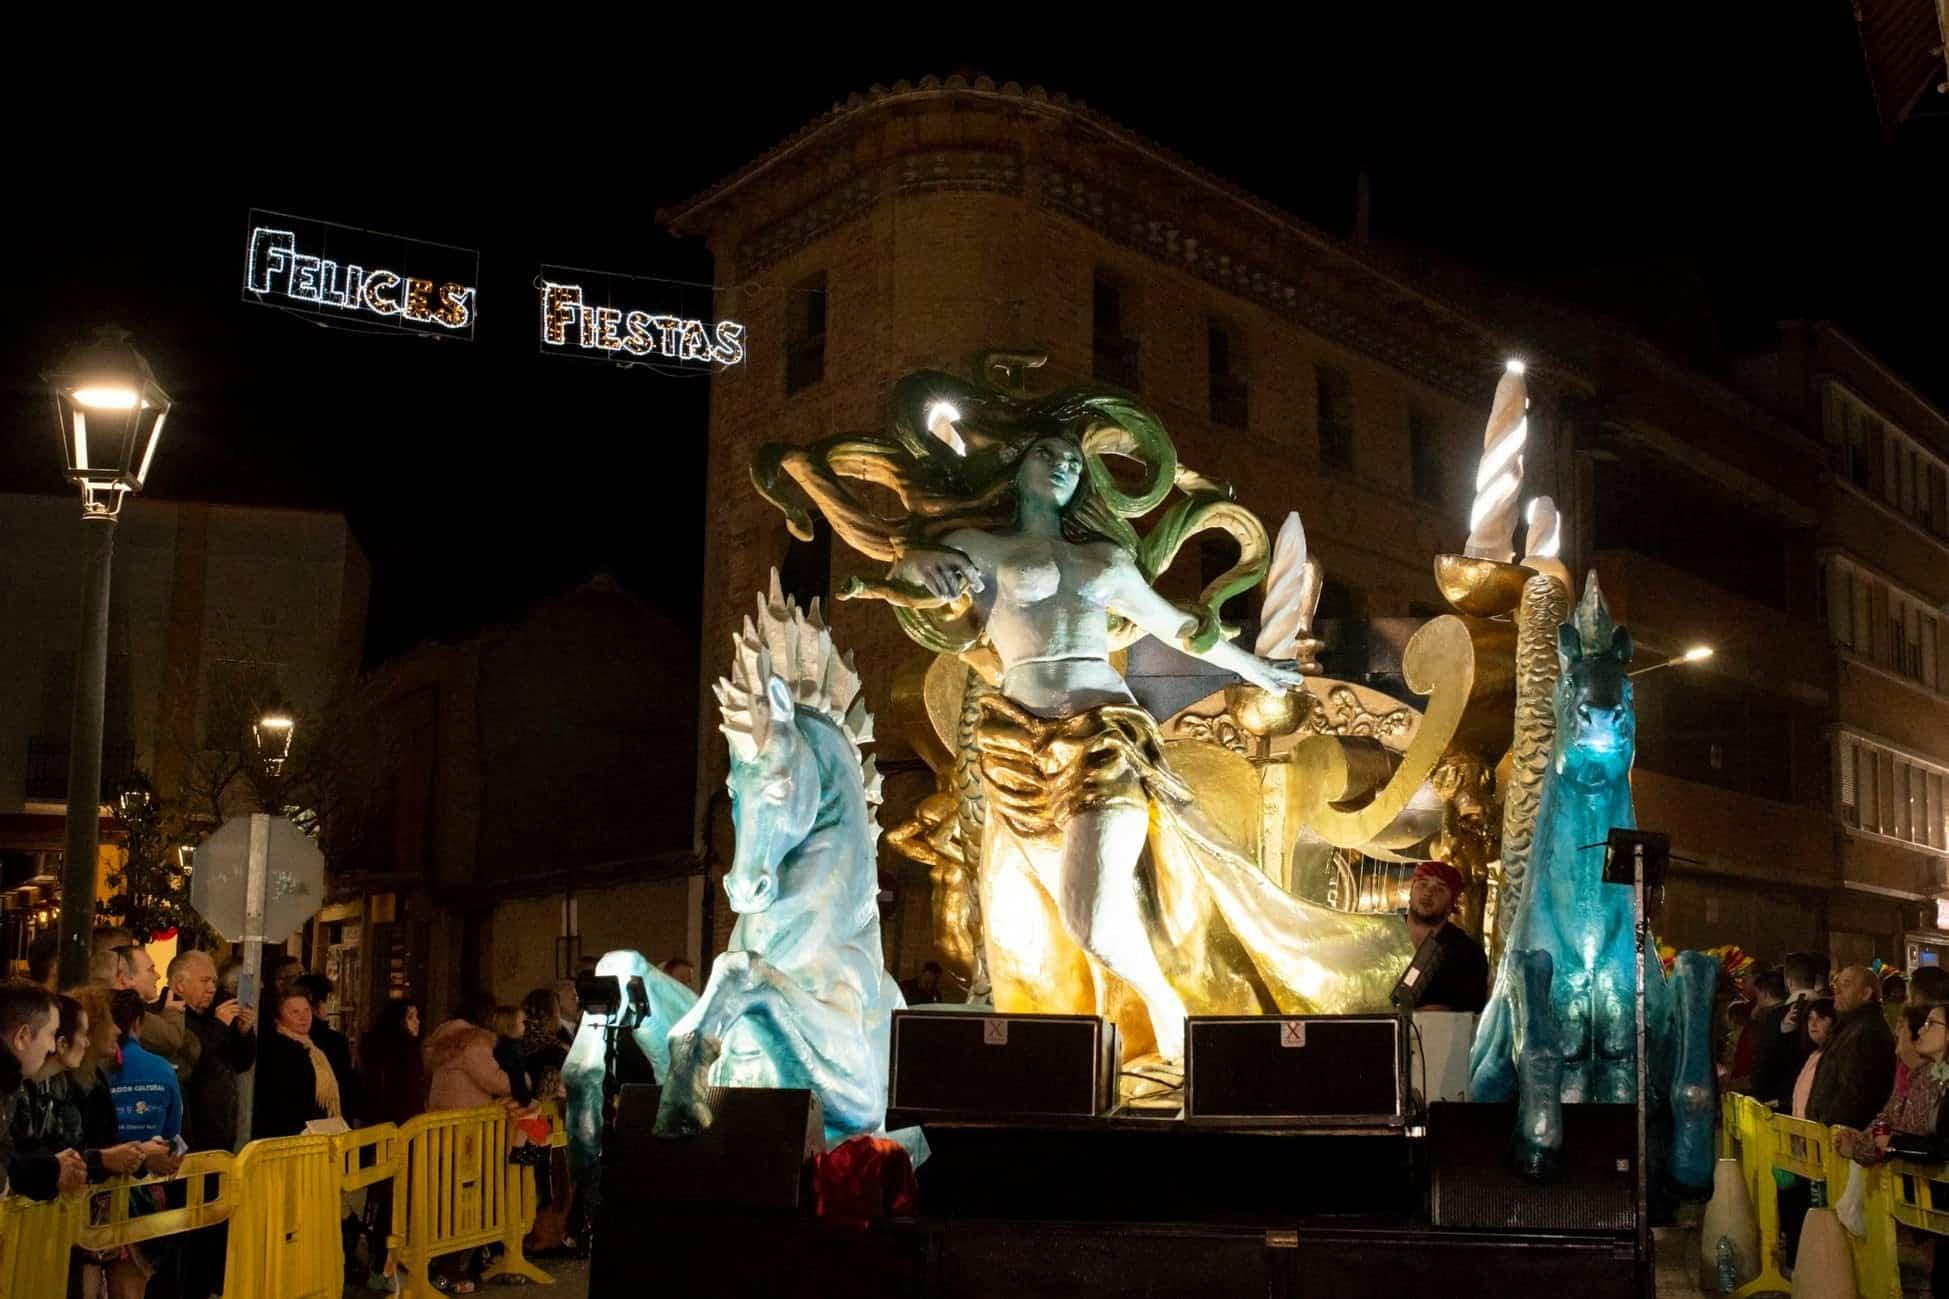 Carnaval de herencia 2020 ofertorio 5 - Selección de fotografías del Ofertorio del Carnaval de Herencia